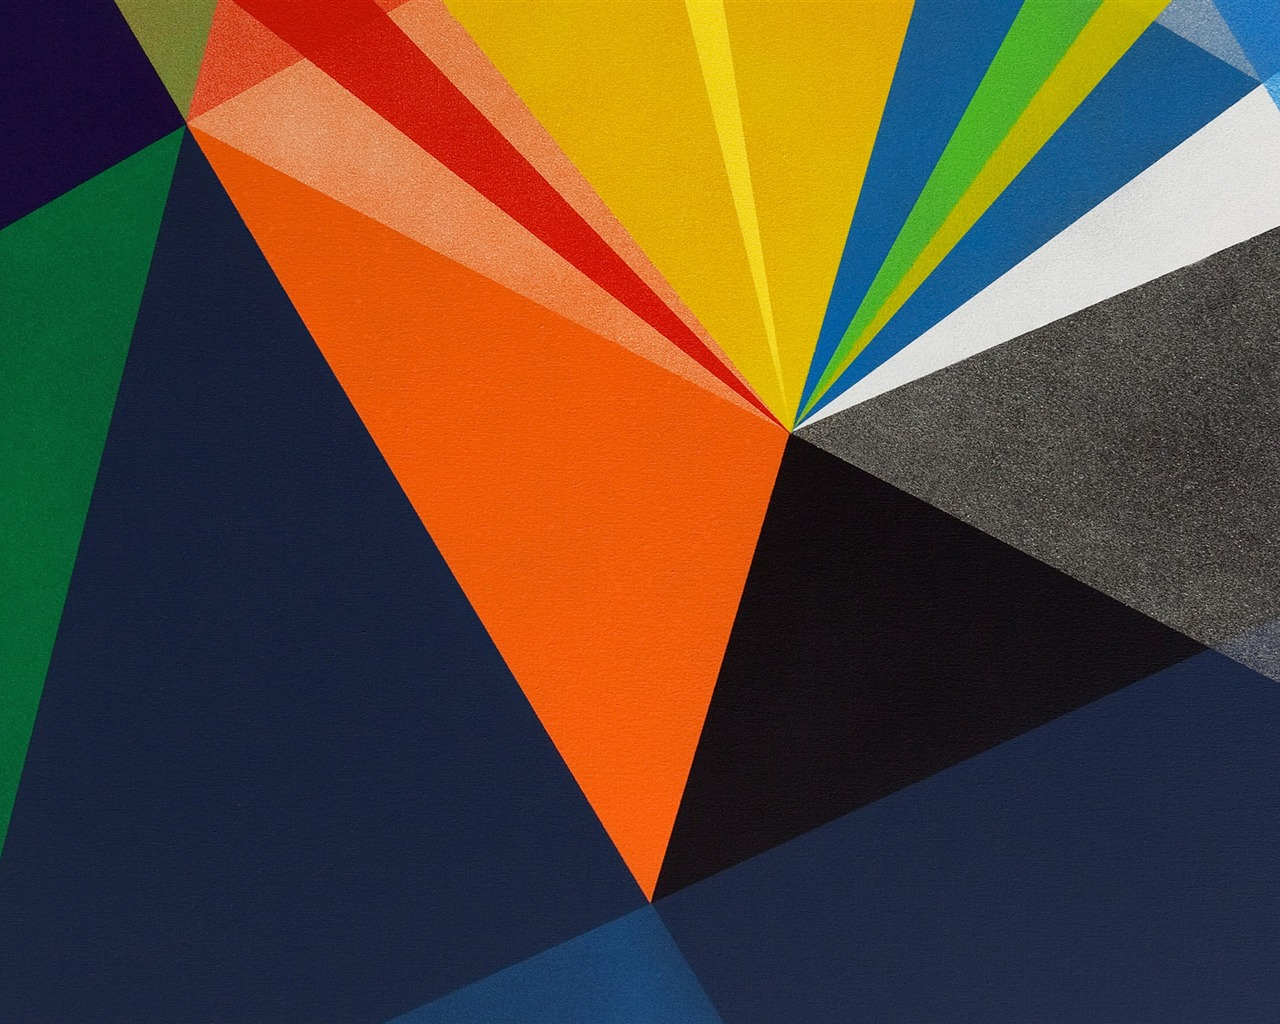 Abstract Blocks Of Color Mac Os Wallpaper Preview 10wallpaper Com